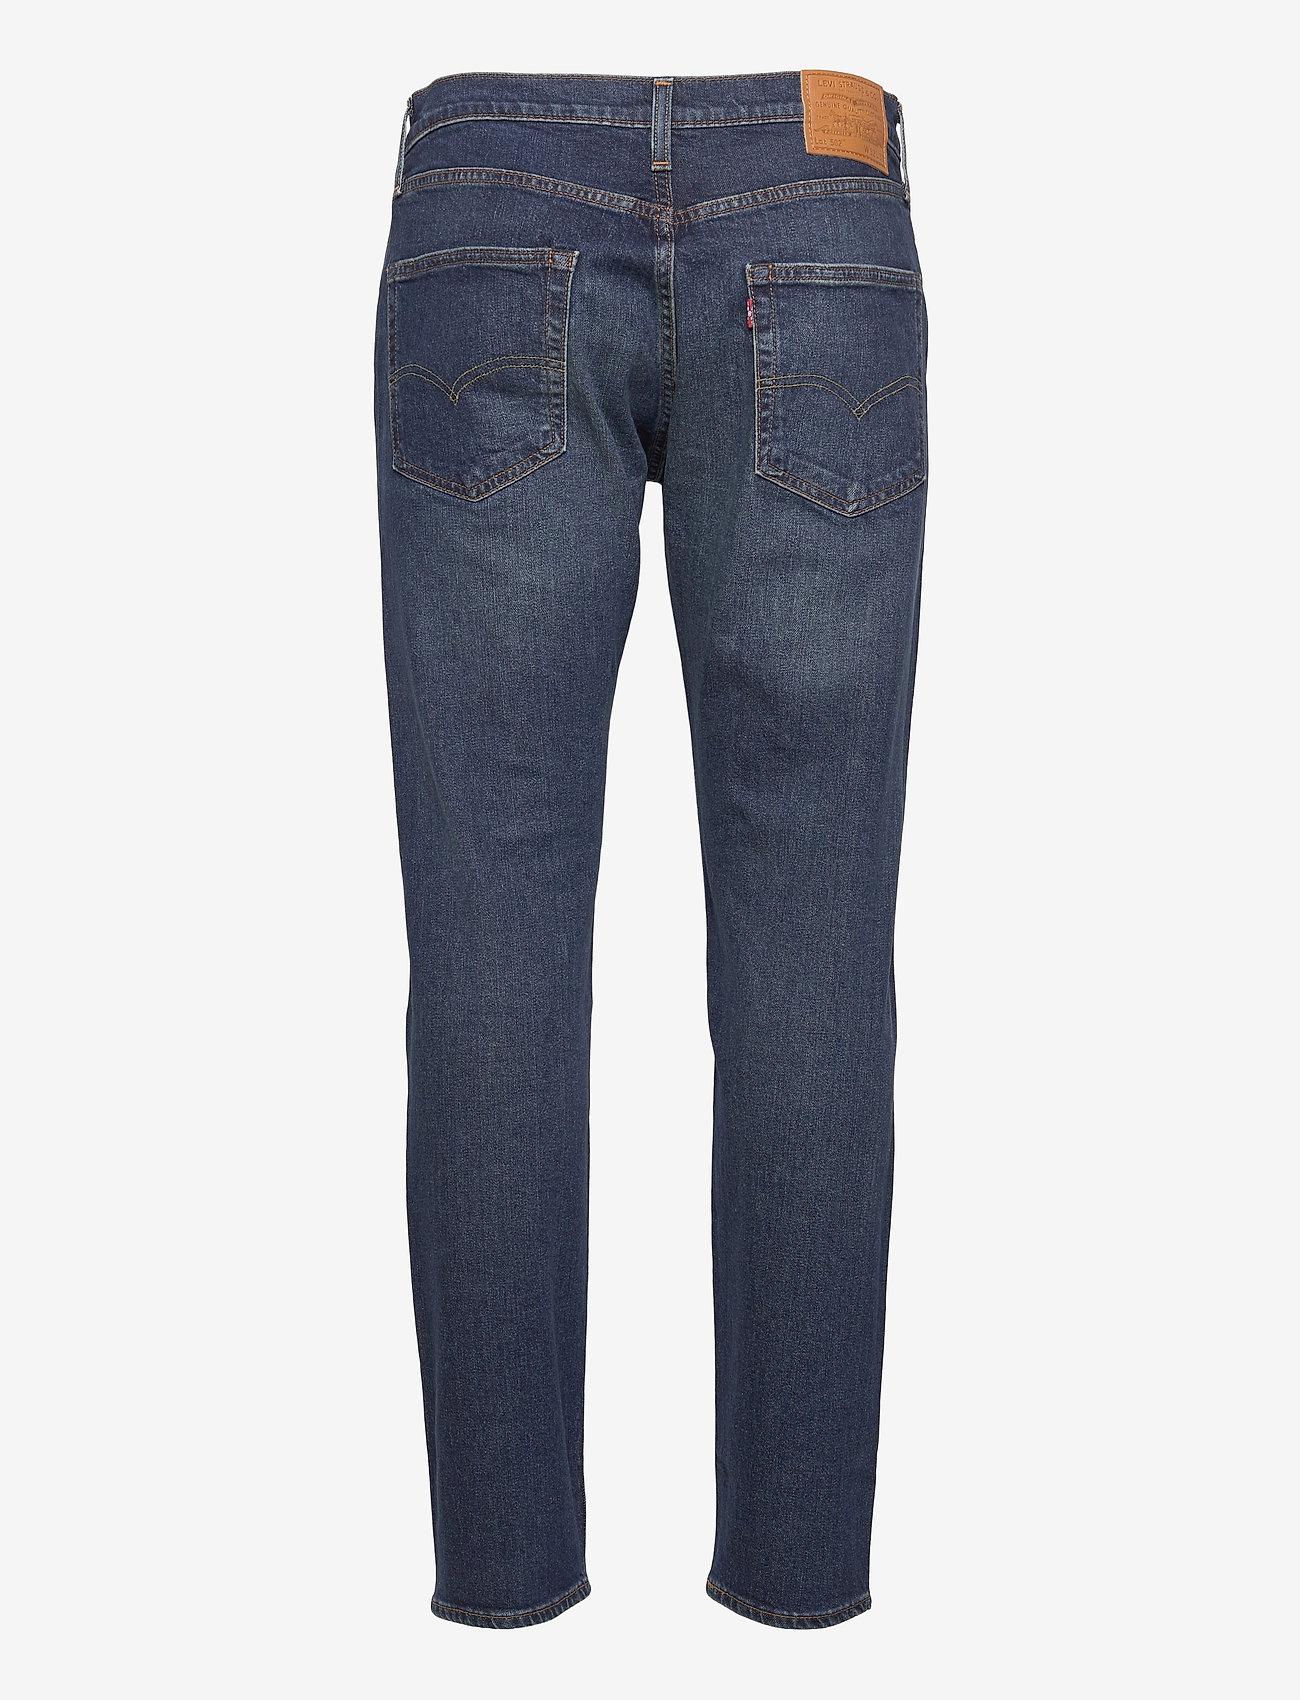 LEVI´S Men - 502 TAPER MOTO CROSS ADV - regular jeans - dark indigo - worn in - 1